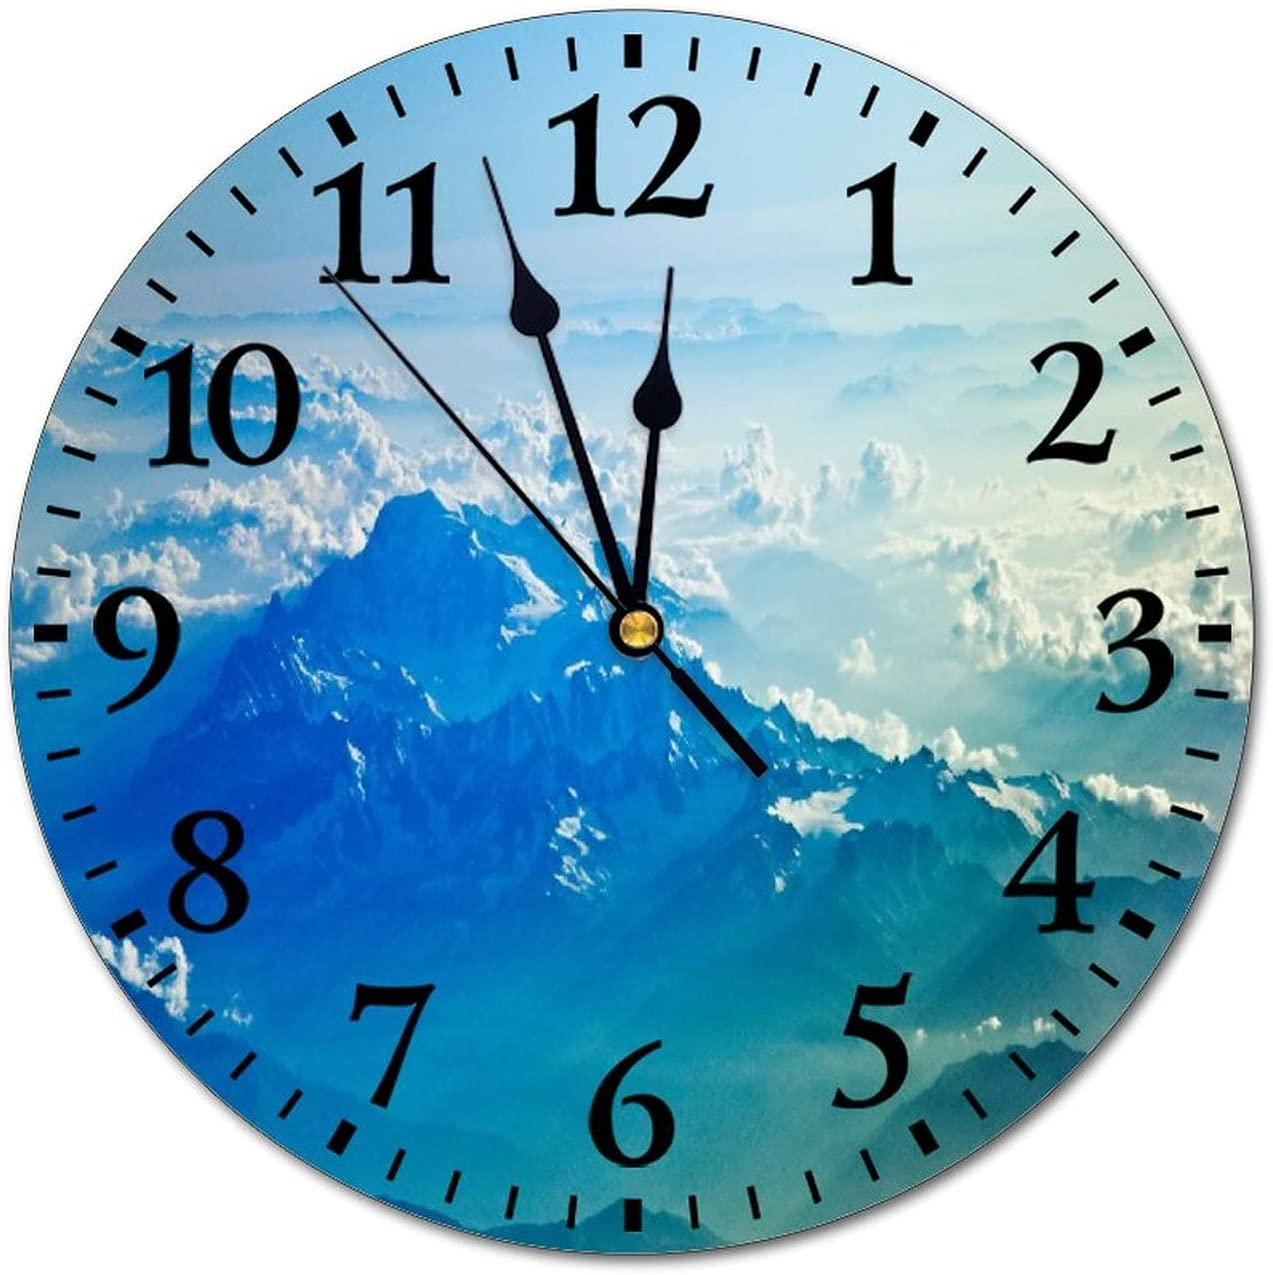 Promini Fashion PVC Wall Clock ICY Blue Mountain Range Silent Non-Ticking Wall Clock Custom PVC Clock, White-C8 25cm/9.84in